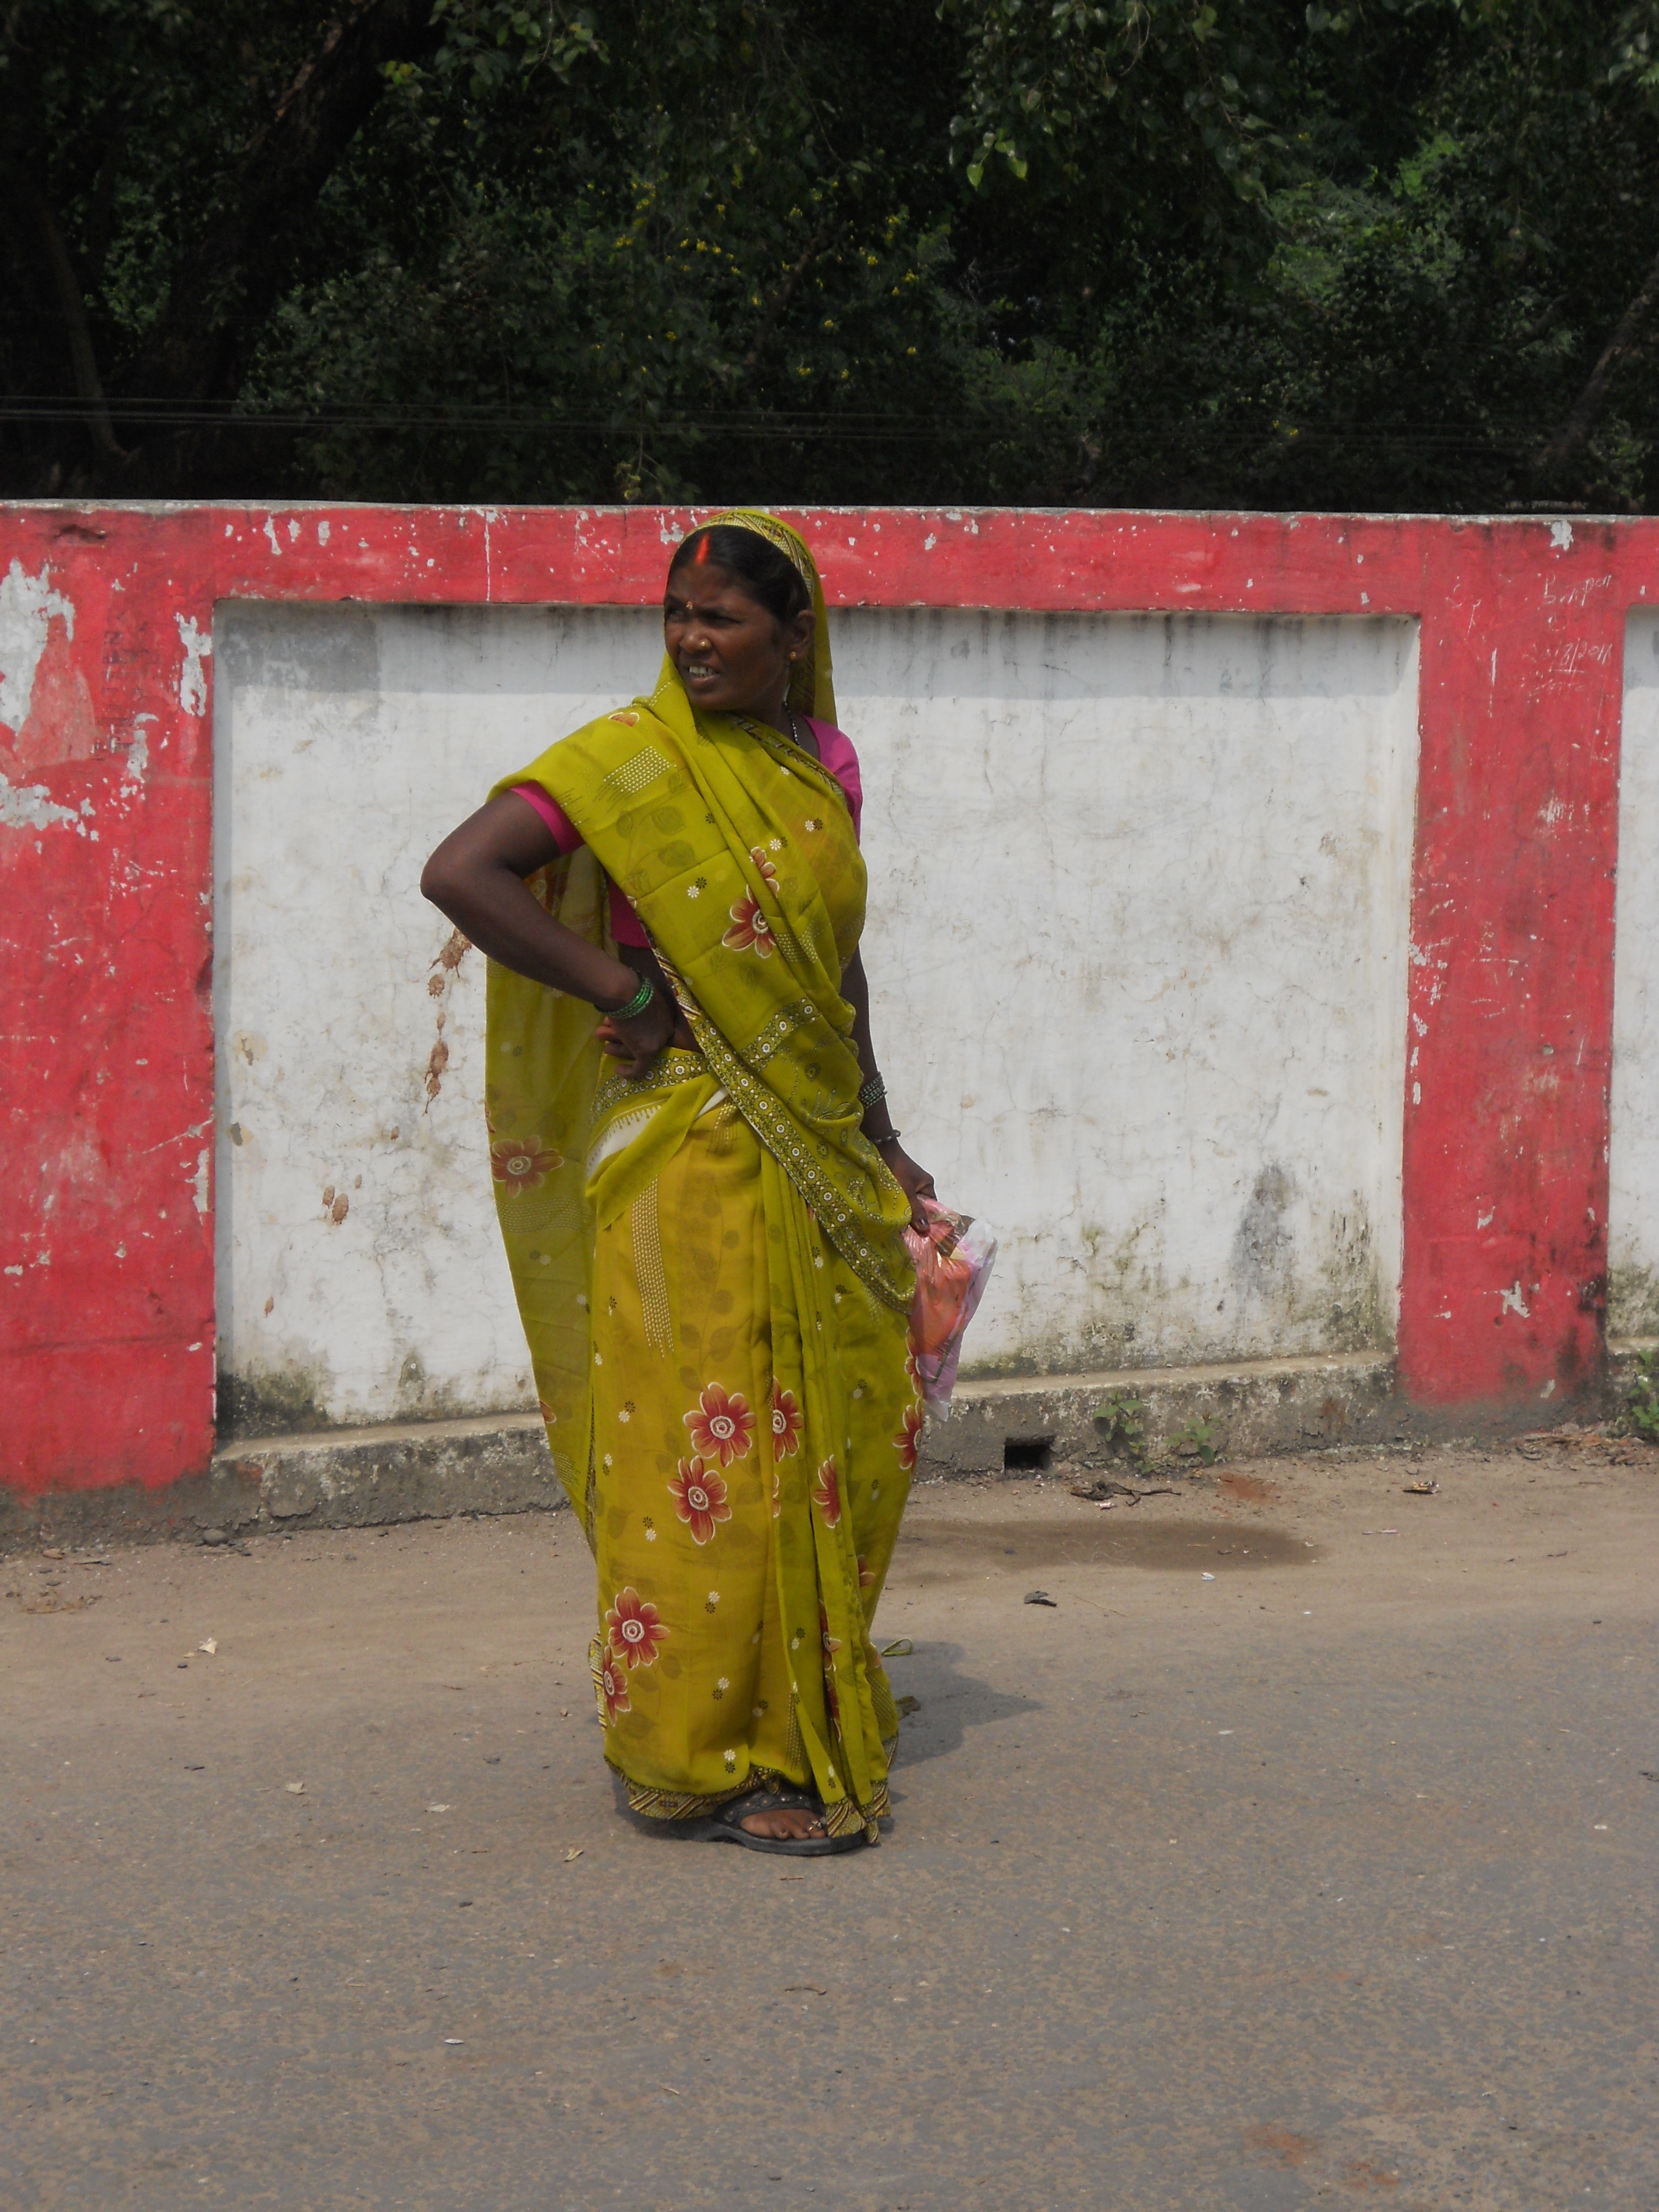 vie quotidienne en Inde